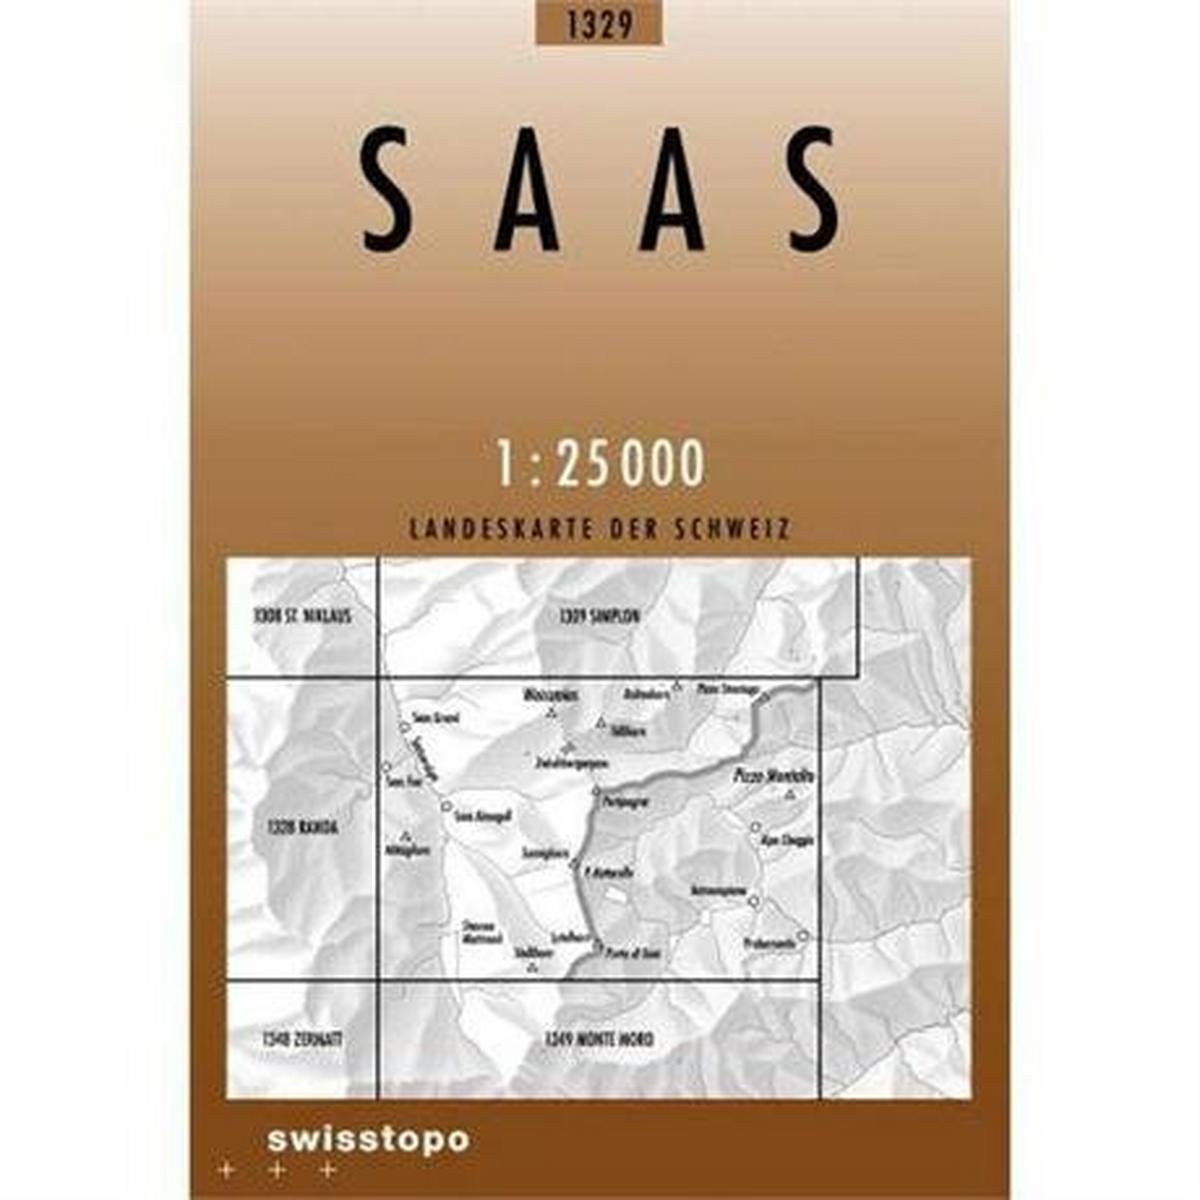 Miscellaneous Switzerland Map 1329 Saas